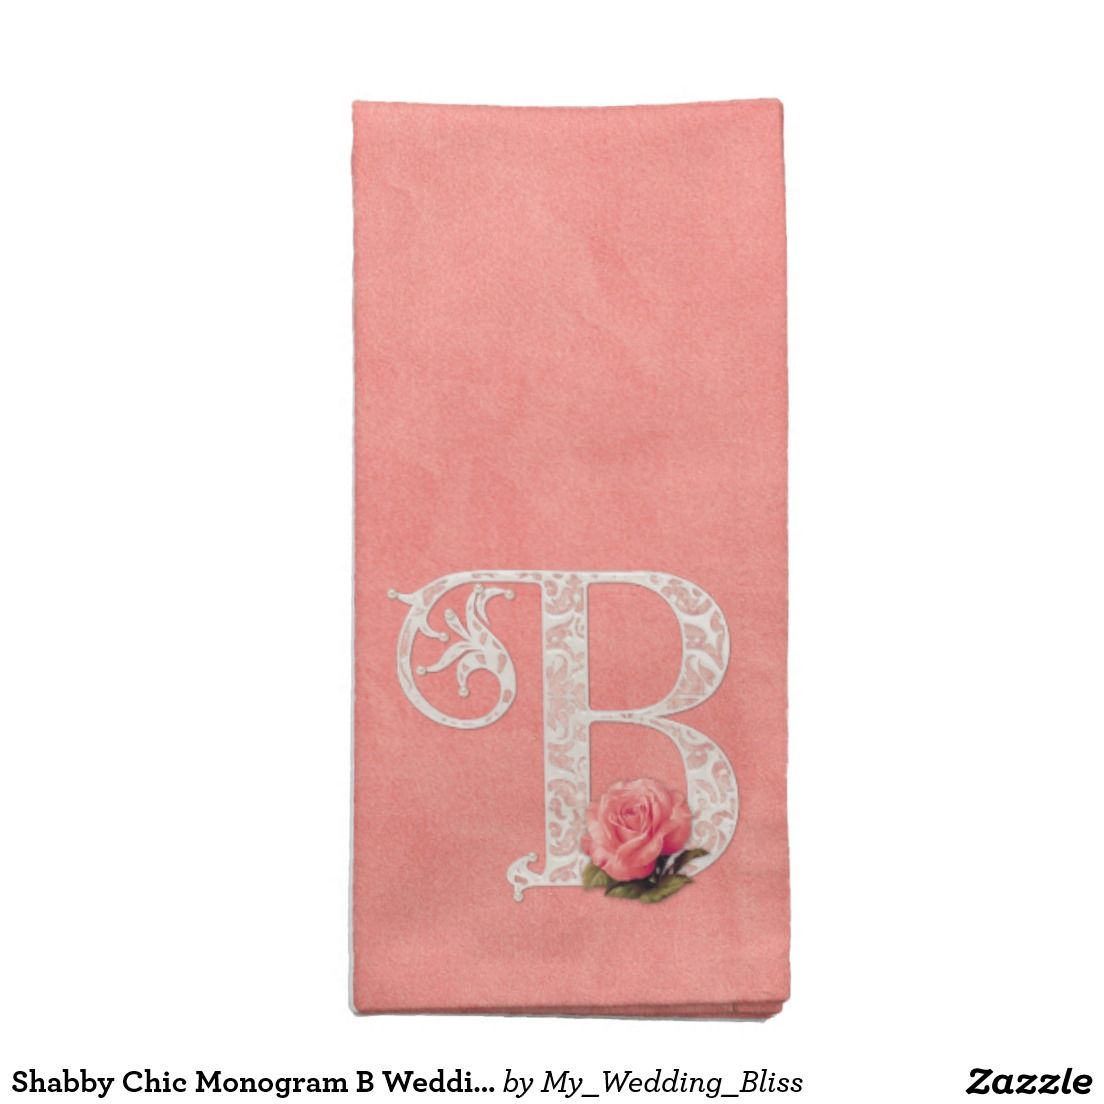 Shabby chic monogram b wedding cloth napkin wedding b and